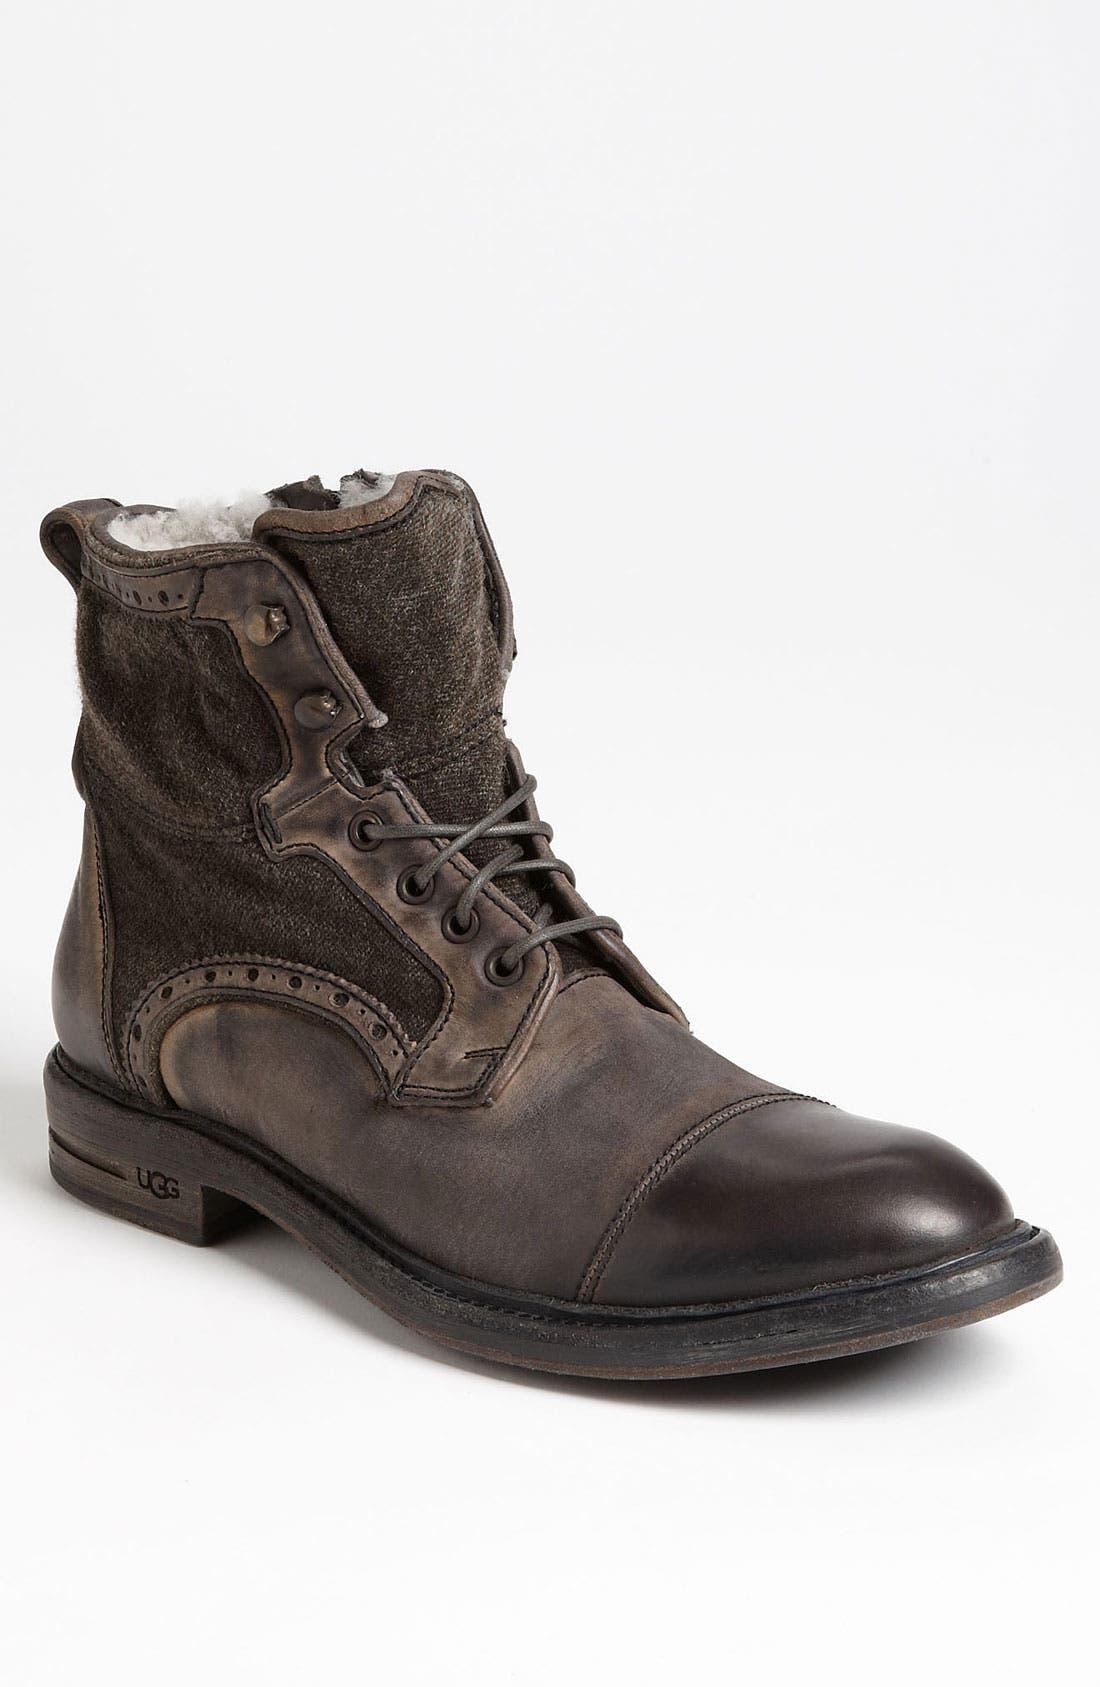 Main Image - UGG® Collection 'Malden' Cap Toe Boot (Men)